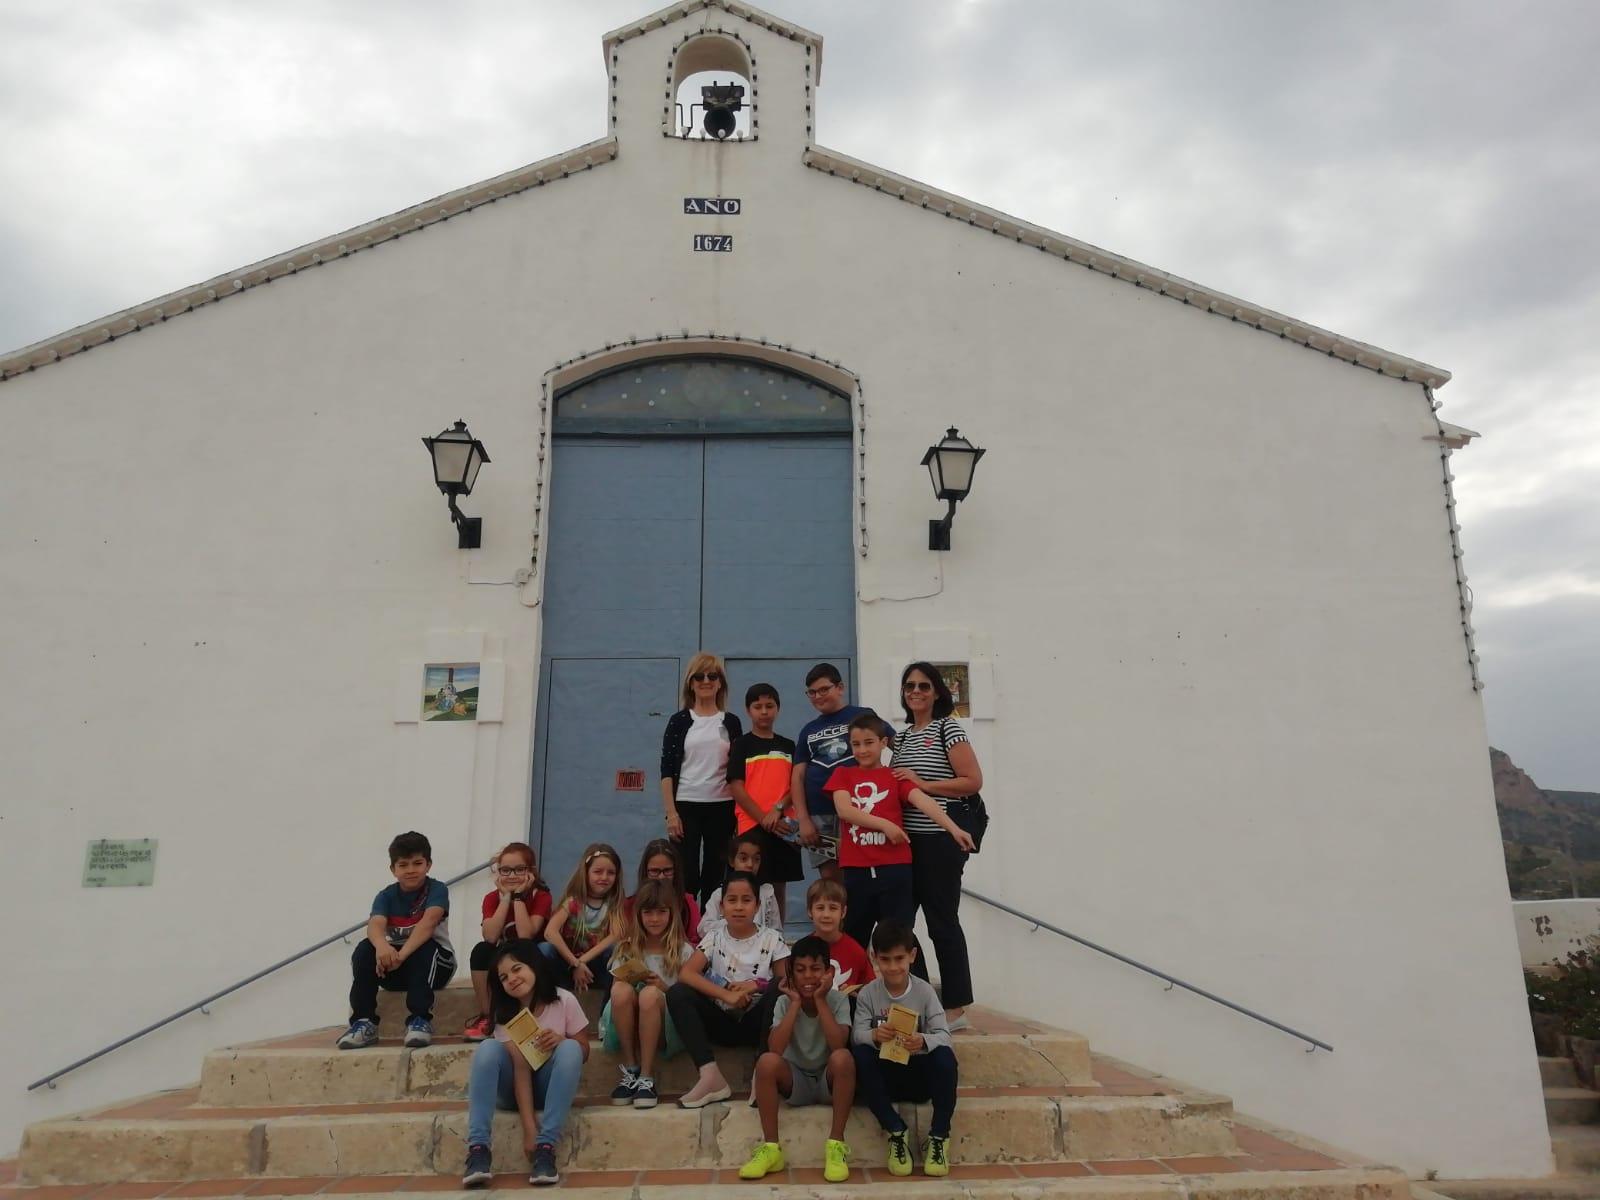 (2019-05-24) Visita ermita alumnos Laura - 3 A primaria - Reina Sofia - María Isabel Berenguer (02)